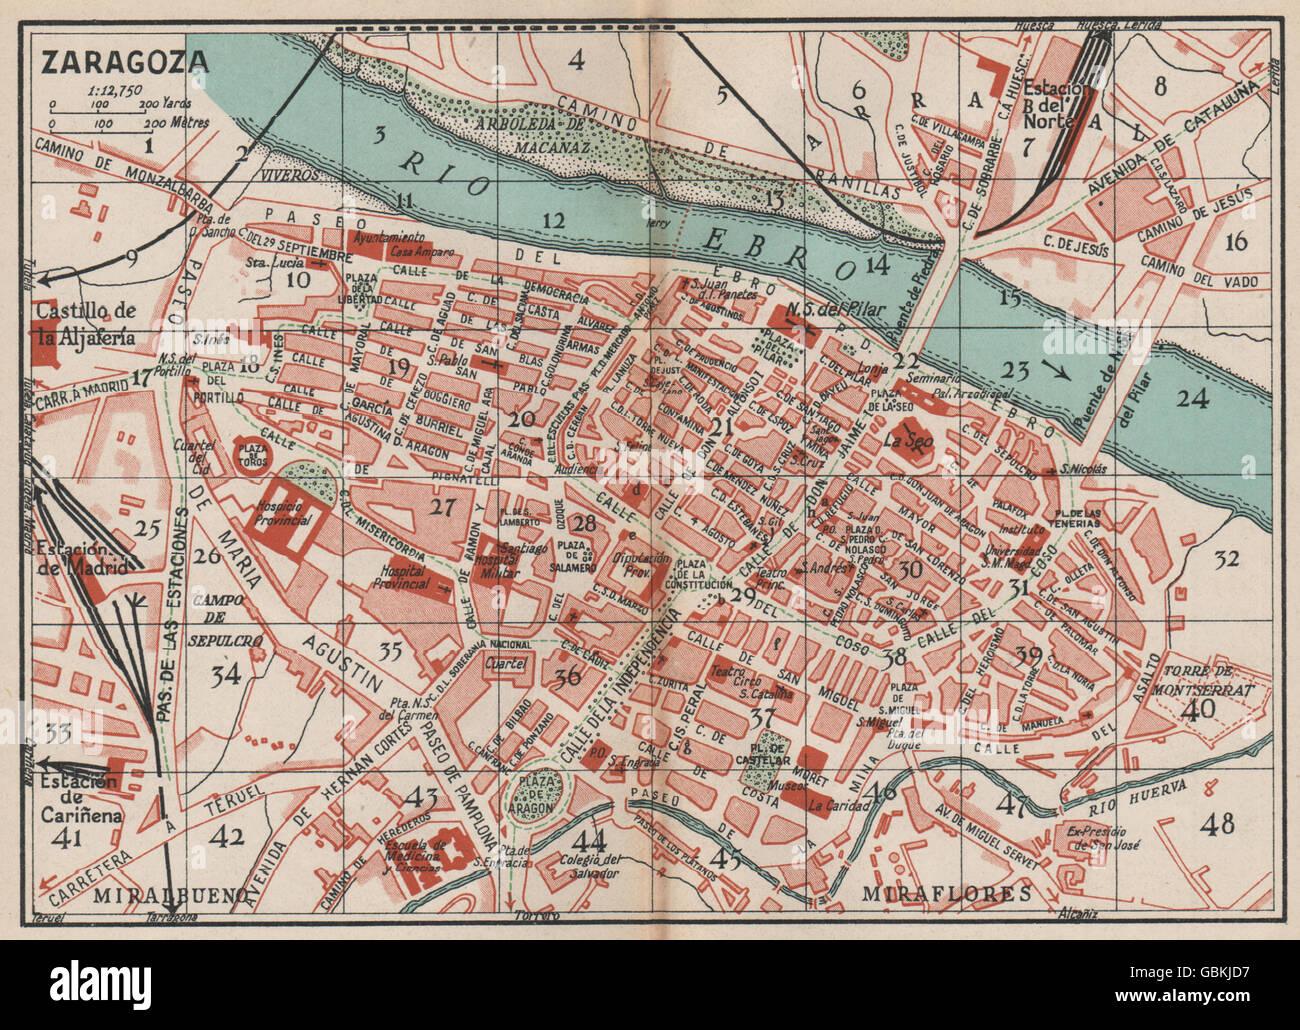 Zaragoza Map Of Spain.Zaragoza Vintage Town City Map Plan Spain 1930 Stock Photo